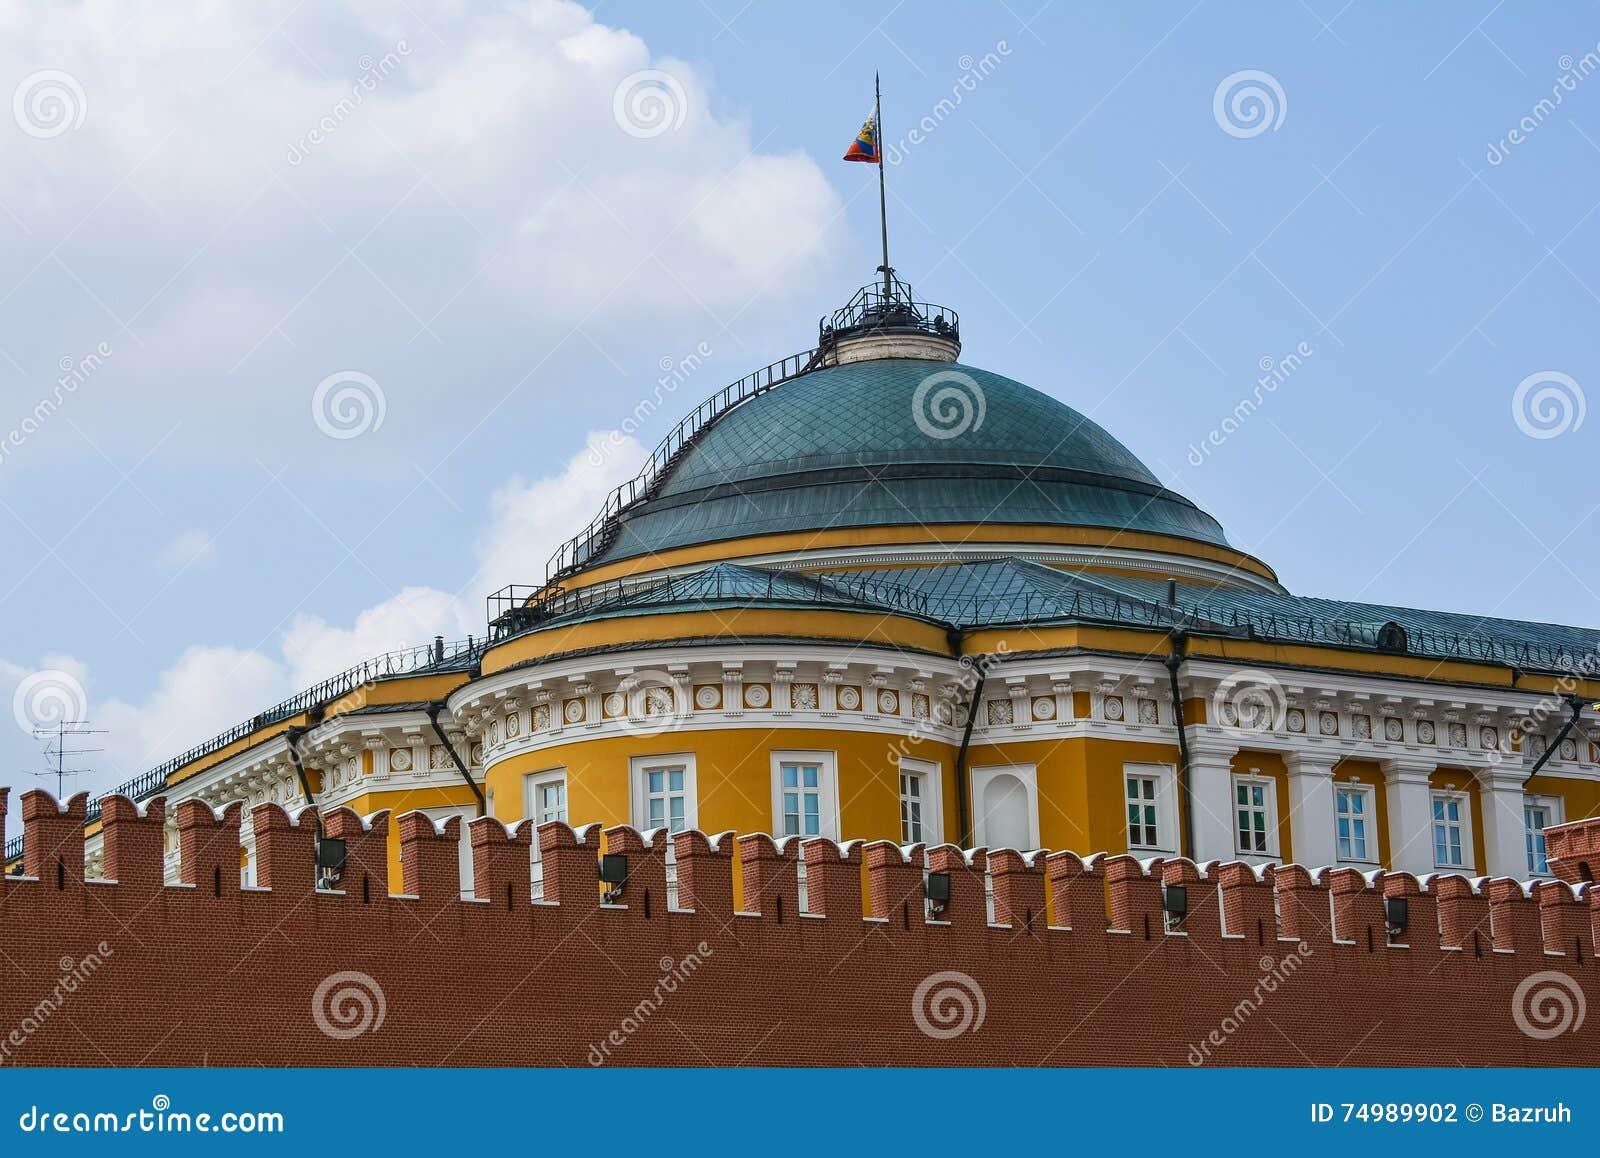 Kremlevky wall